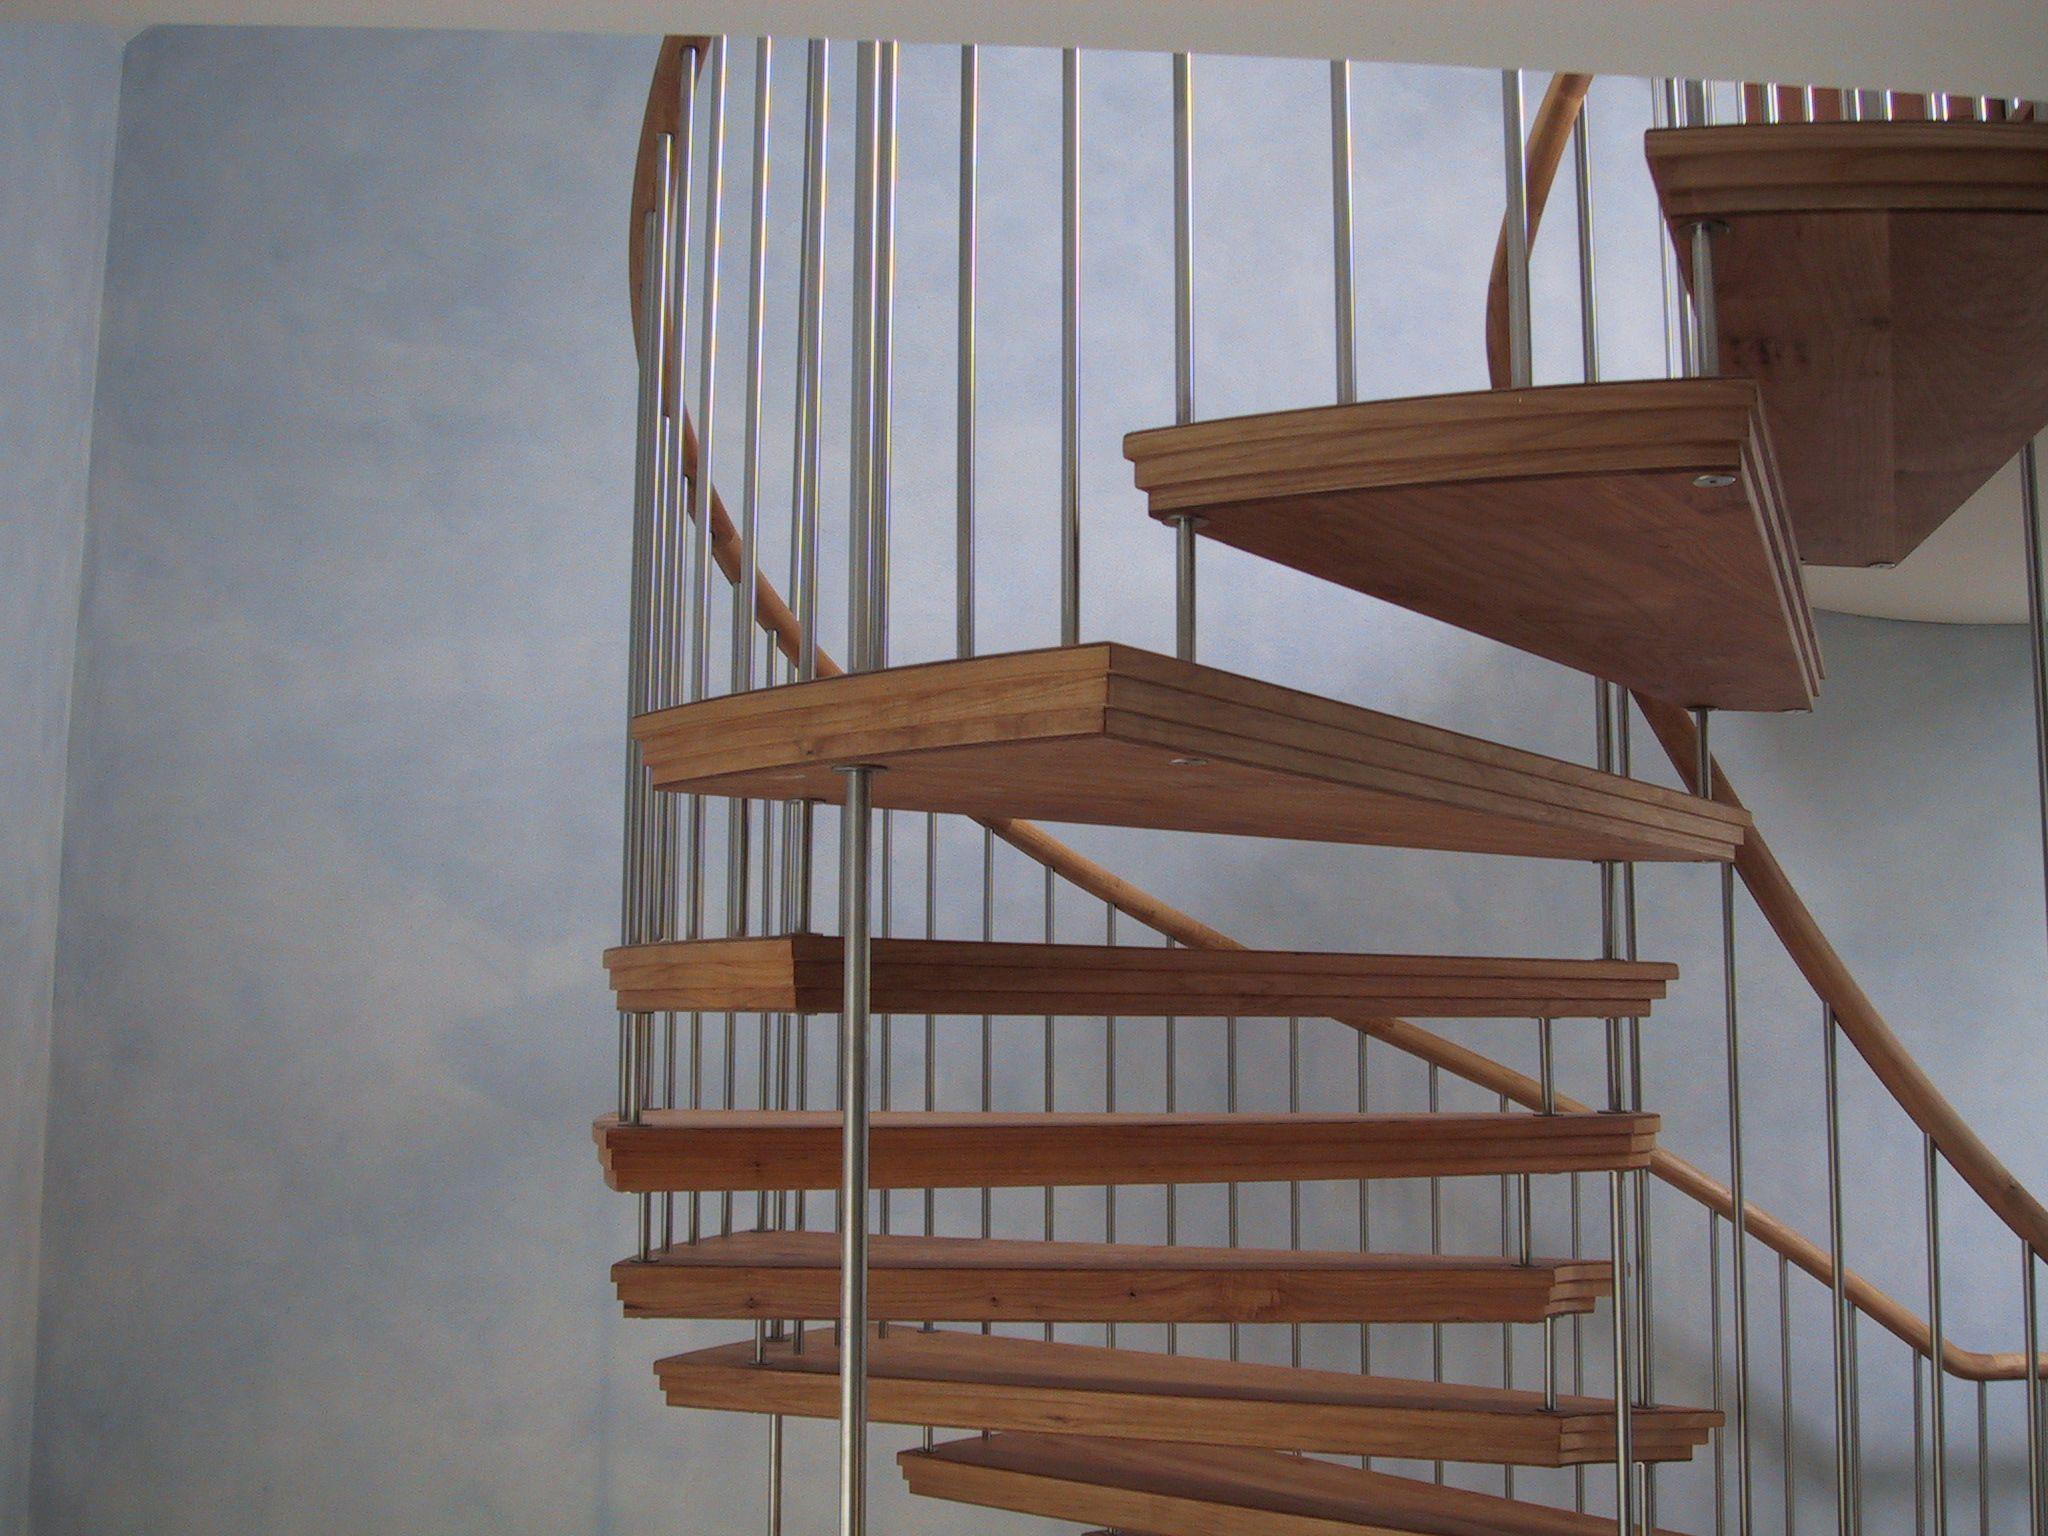 Stair Image 13